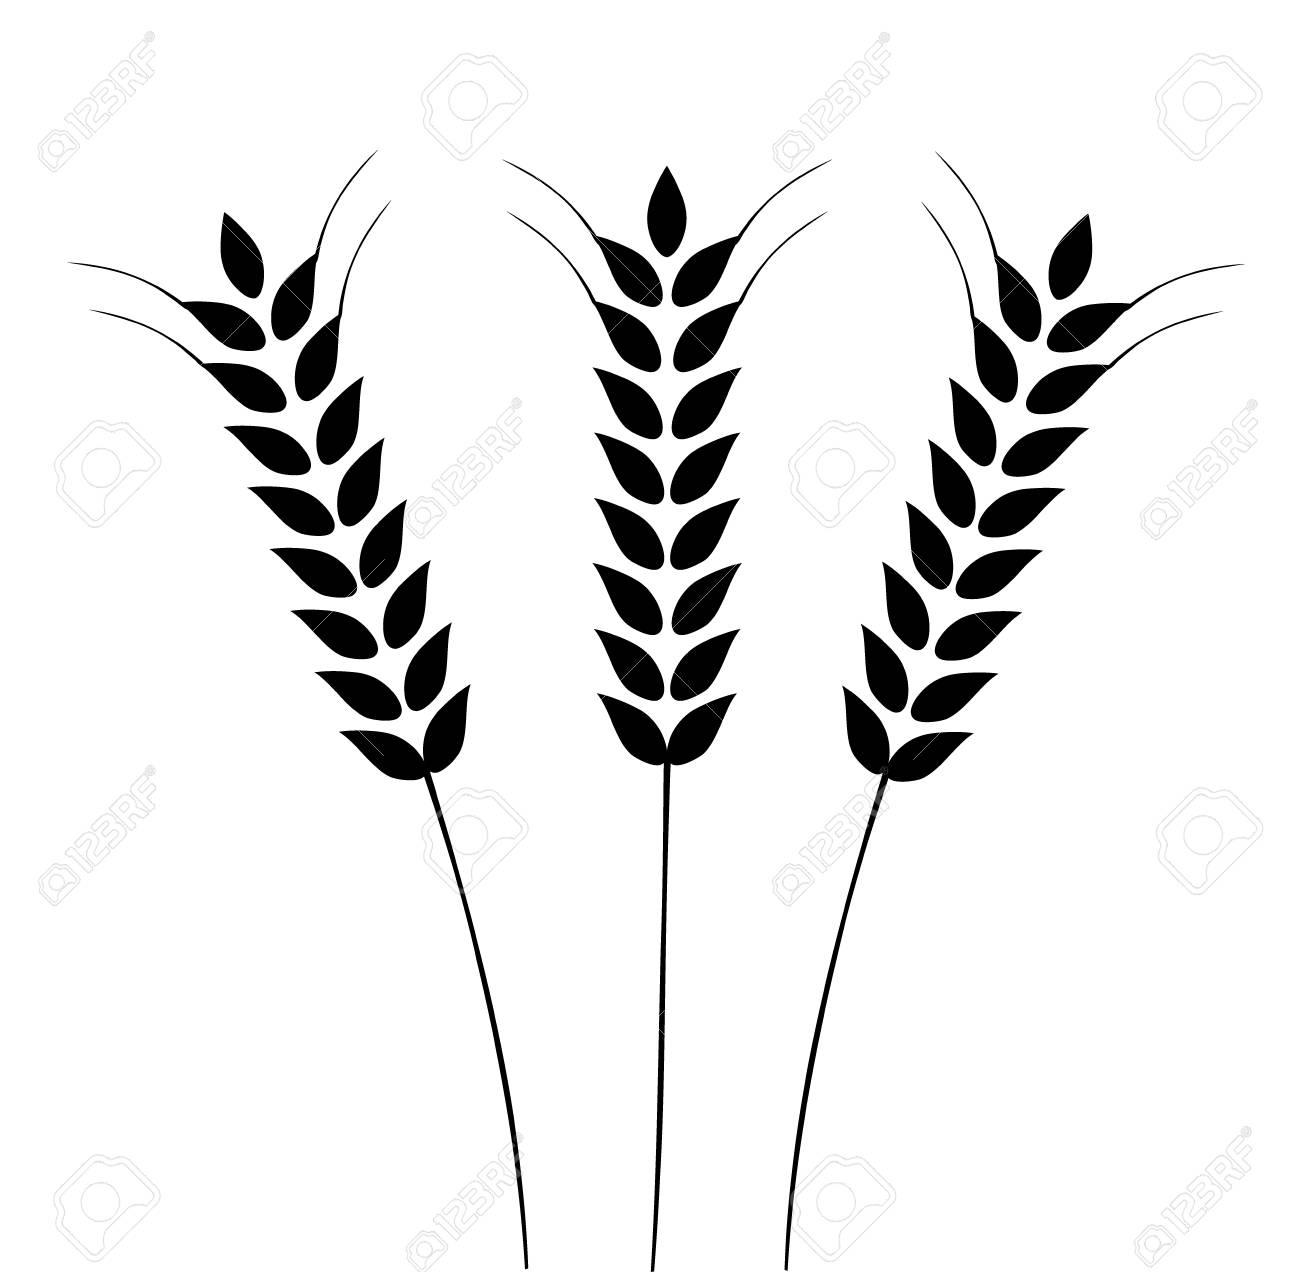 vector illustration of ears of wheat barley or rye ideal for rh 123rf com barley vector eps vector barley and hops